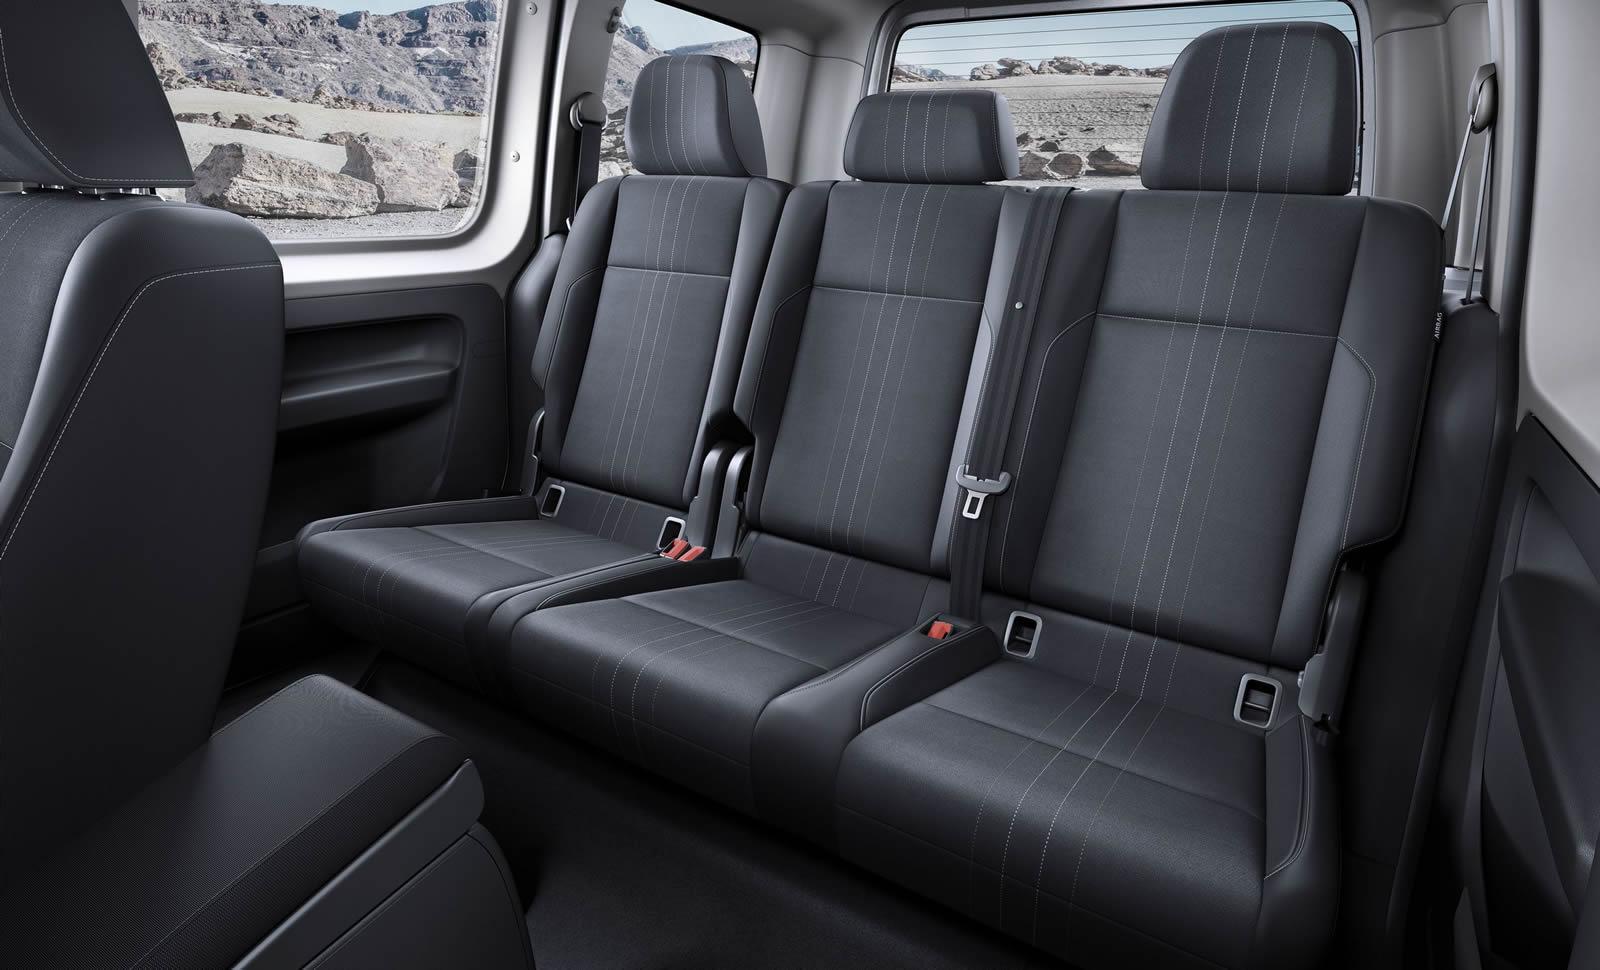 salon de francfort 2015 volkswagen caddy alltrack un van tout chemin. Black Bedroom Furniture Sets. Home Design Ideas